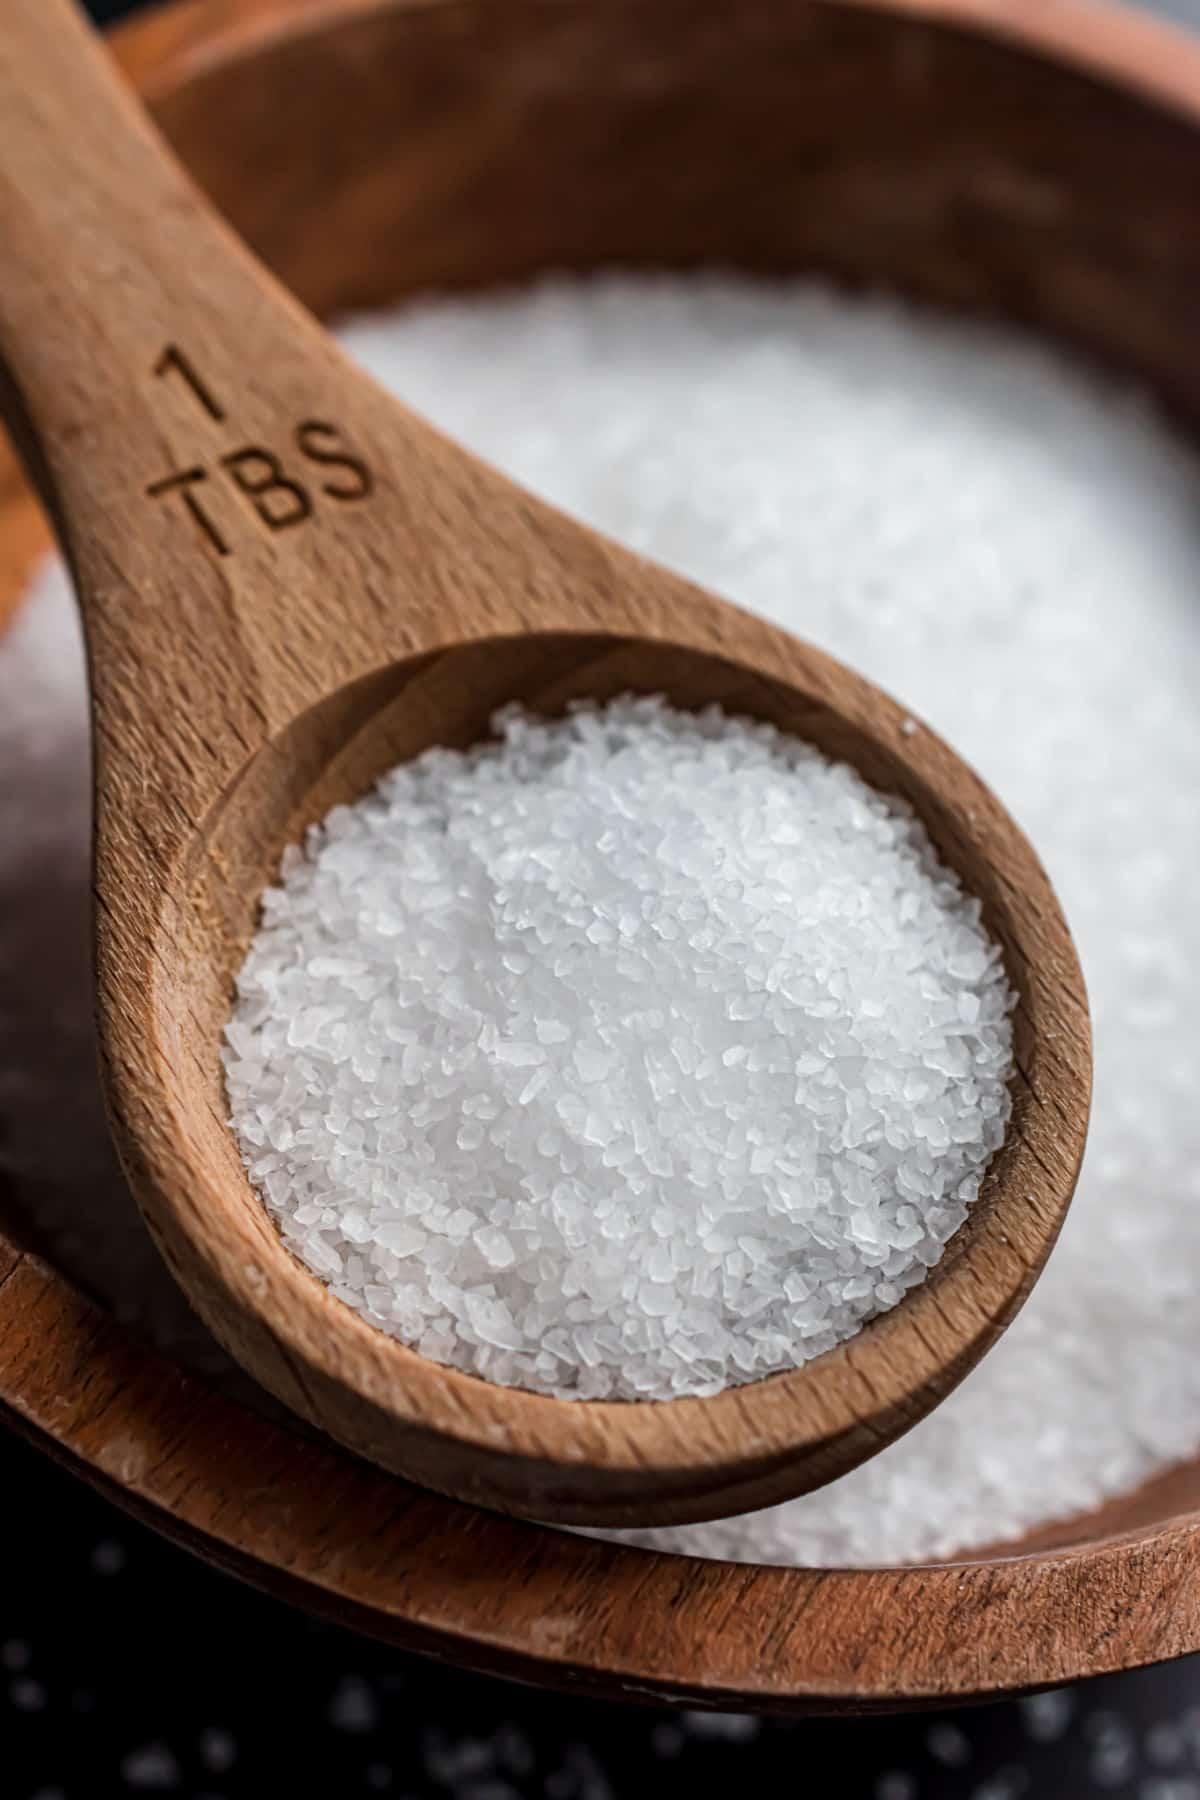 Close up photo of kosher salt granules.